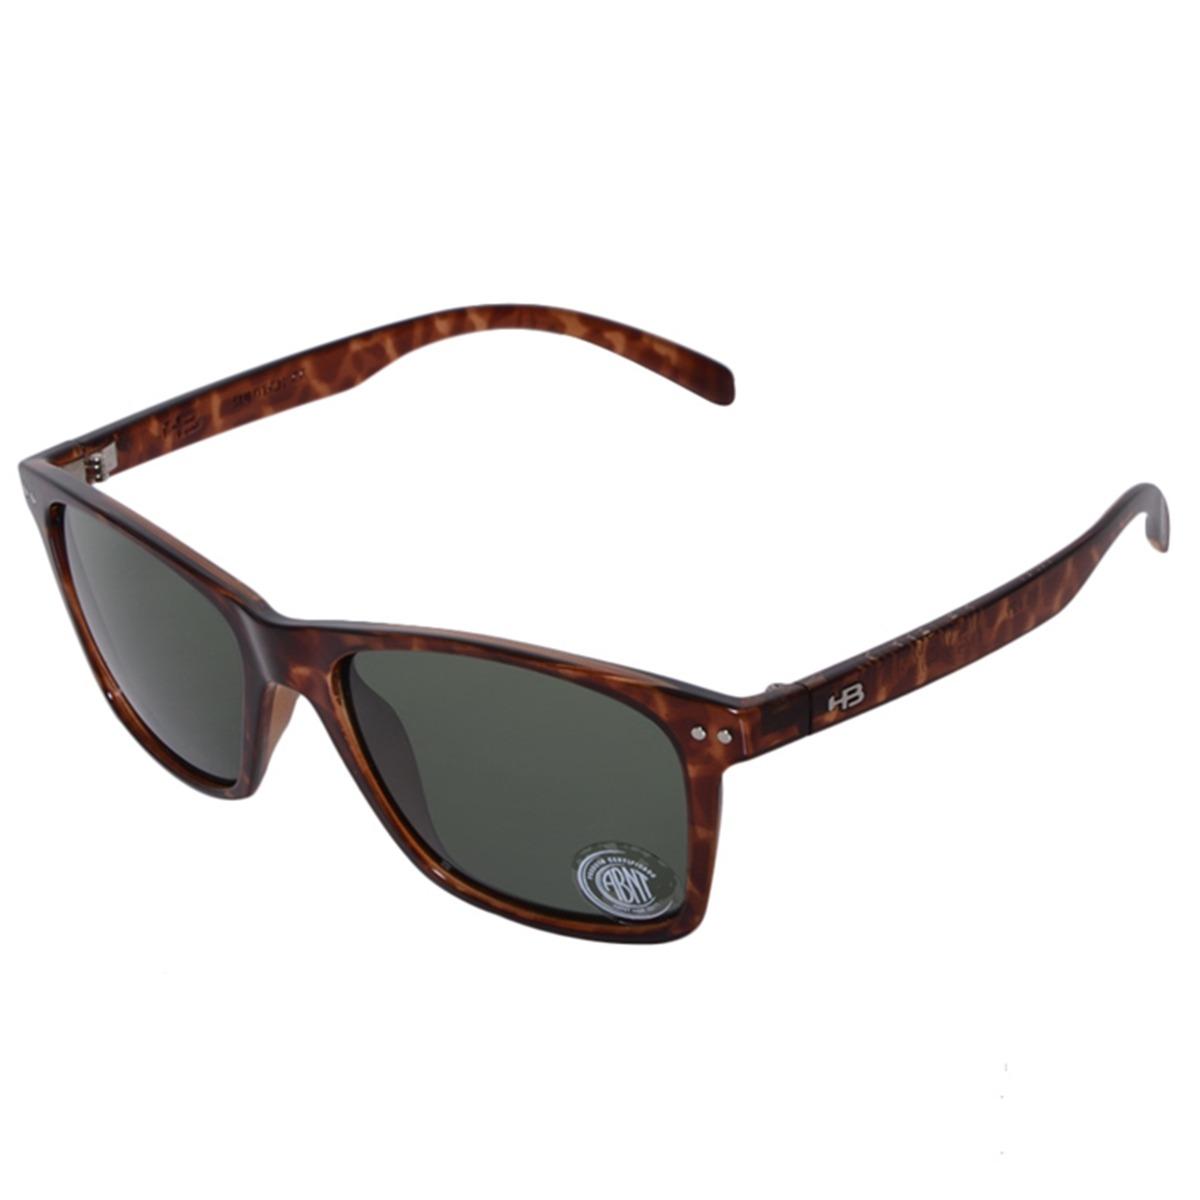 Óculos Hb Nevermind Brown Turtle - R  299,90 em Mercado Livre f60964780b